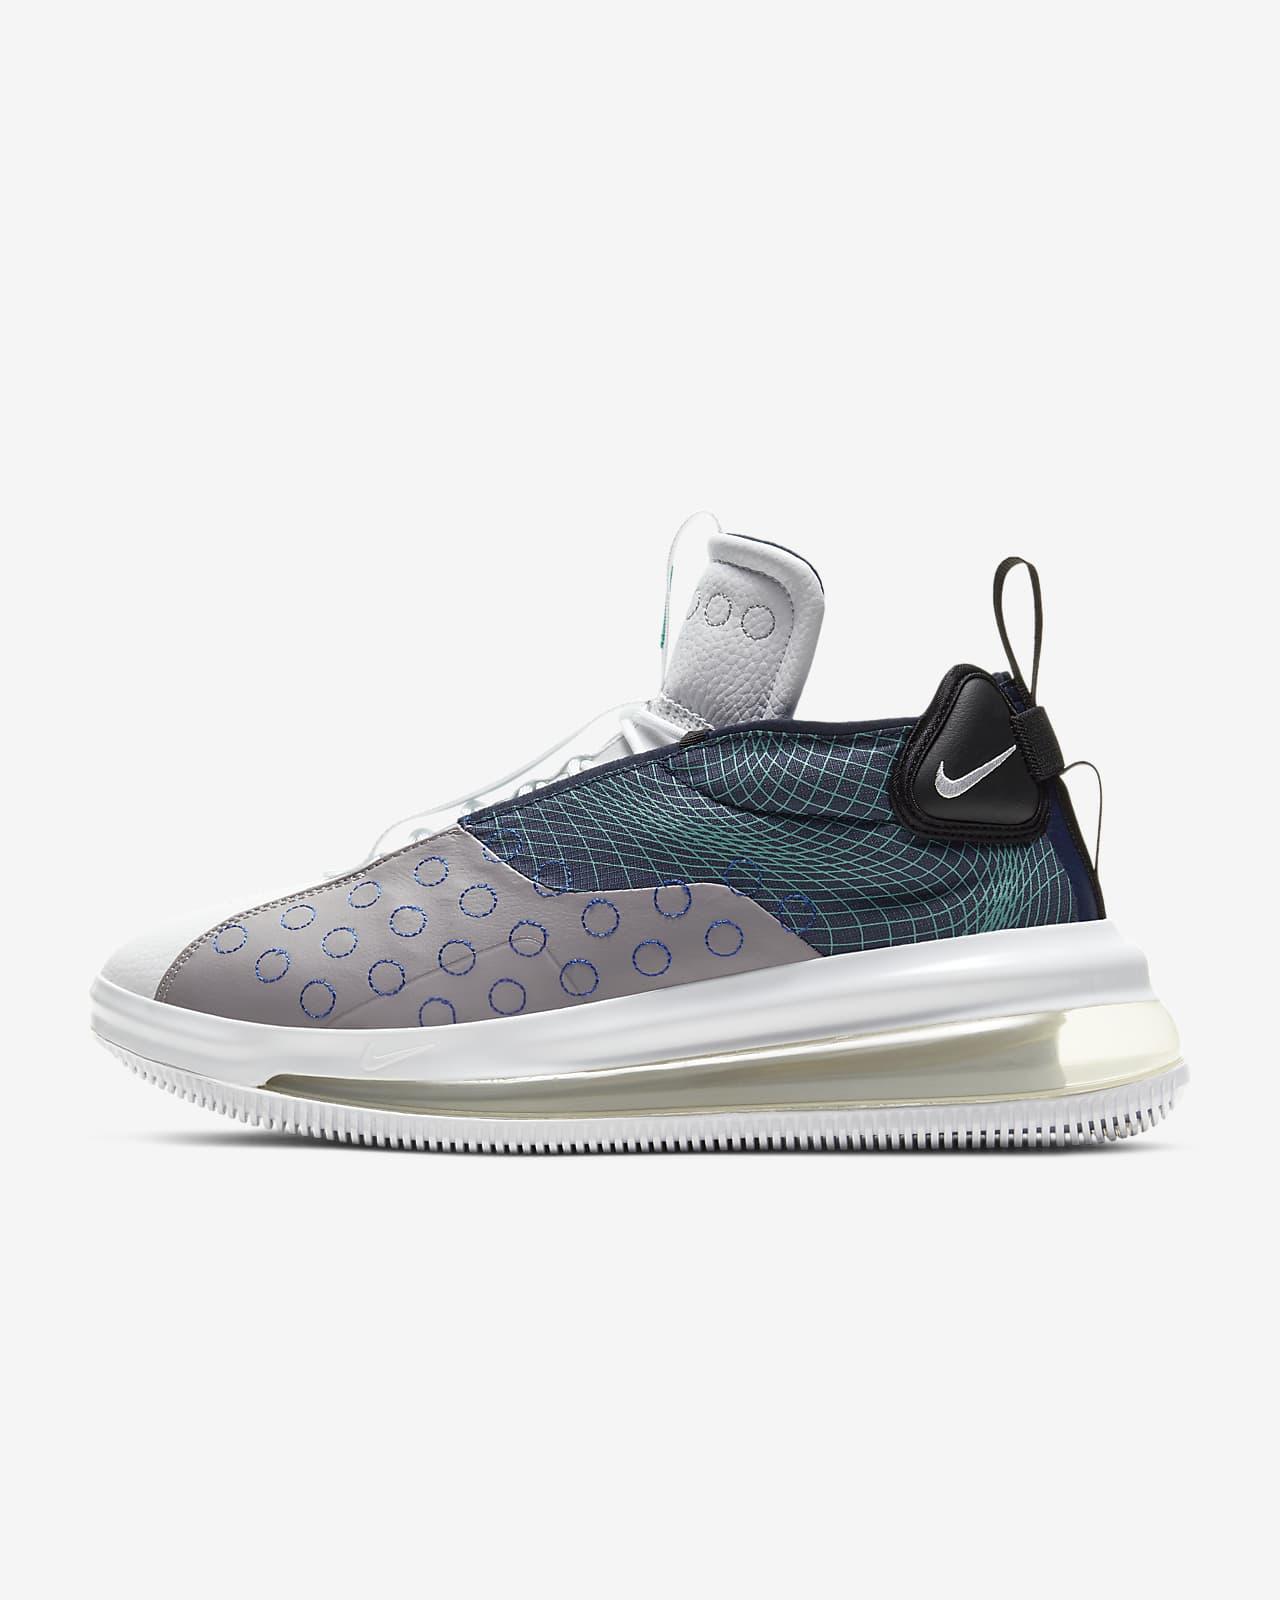 Nike Air Max 720 Waves Men's Shoe. Nike ID